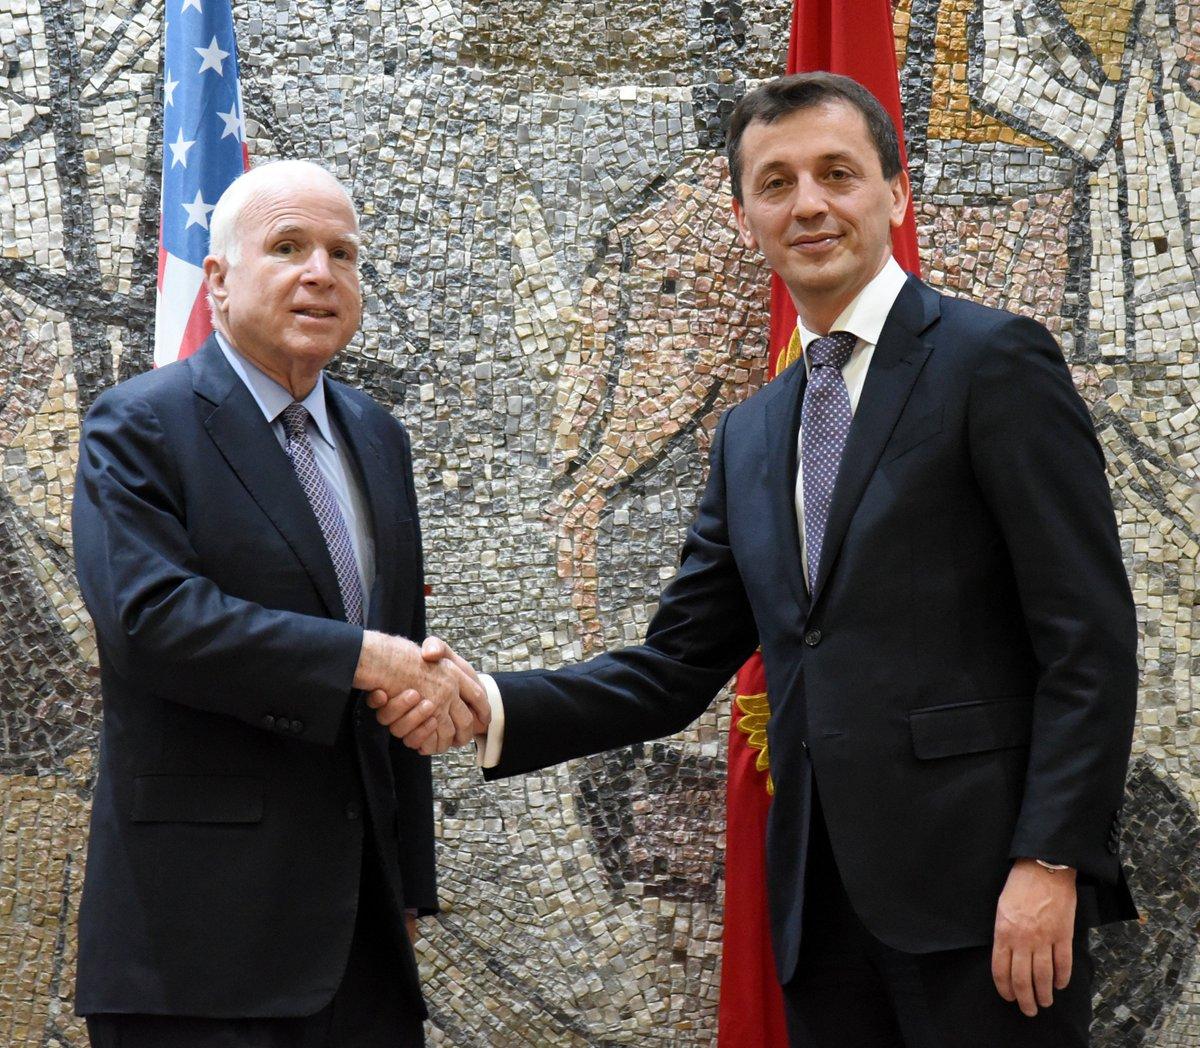 Russia kecam AS terima Montenegro ahli baharu NATO